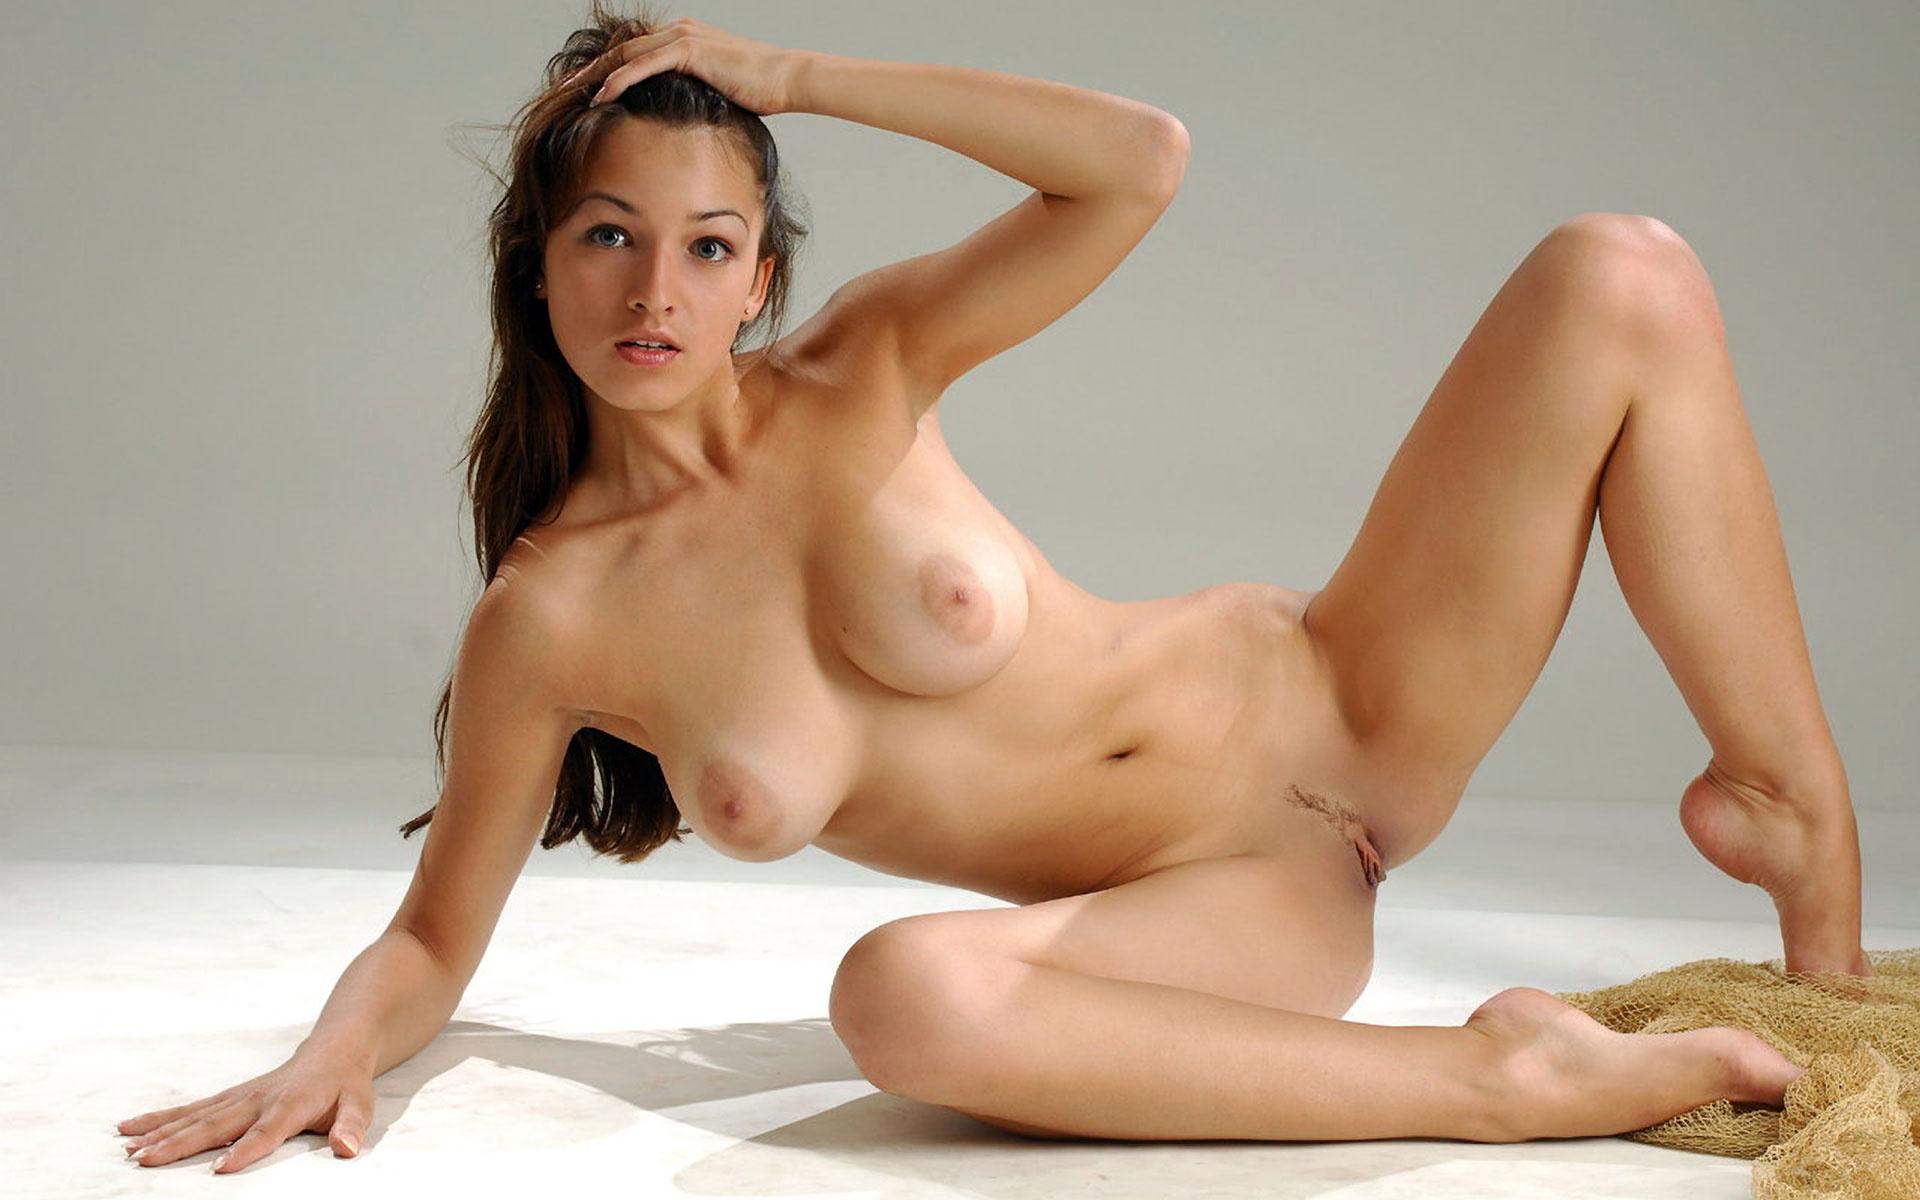 Mexican bbw nude women